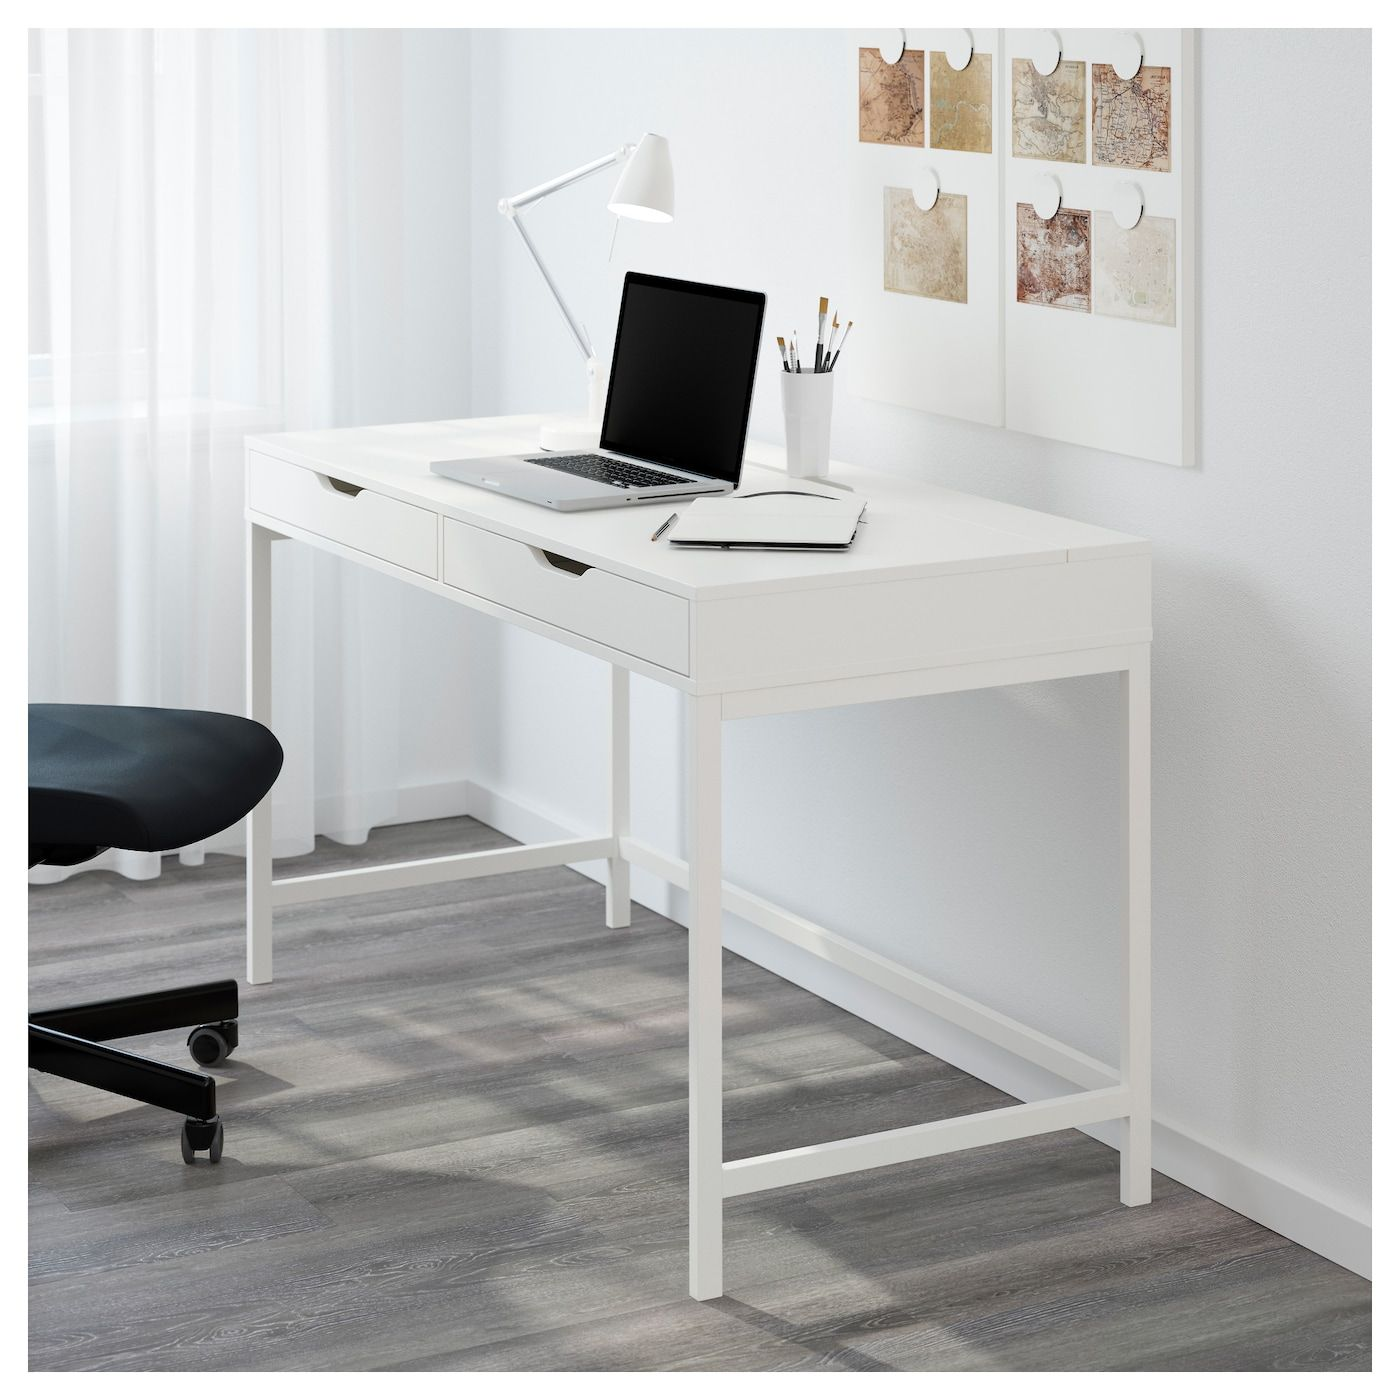 IKEA ALEX White Desk Ikea alex desk, Home office